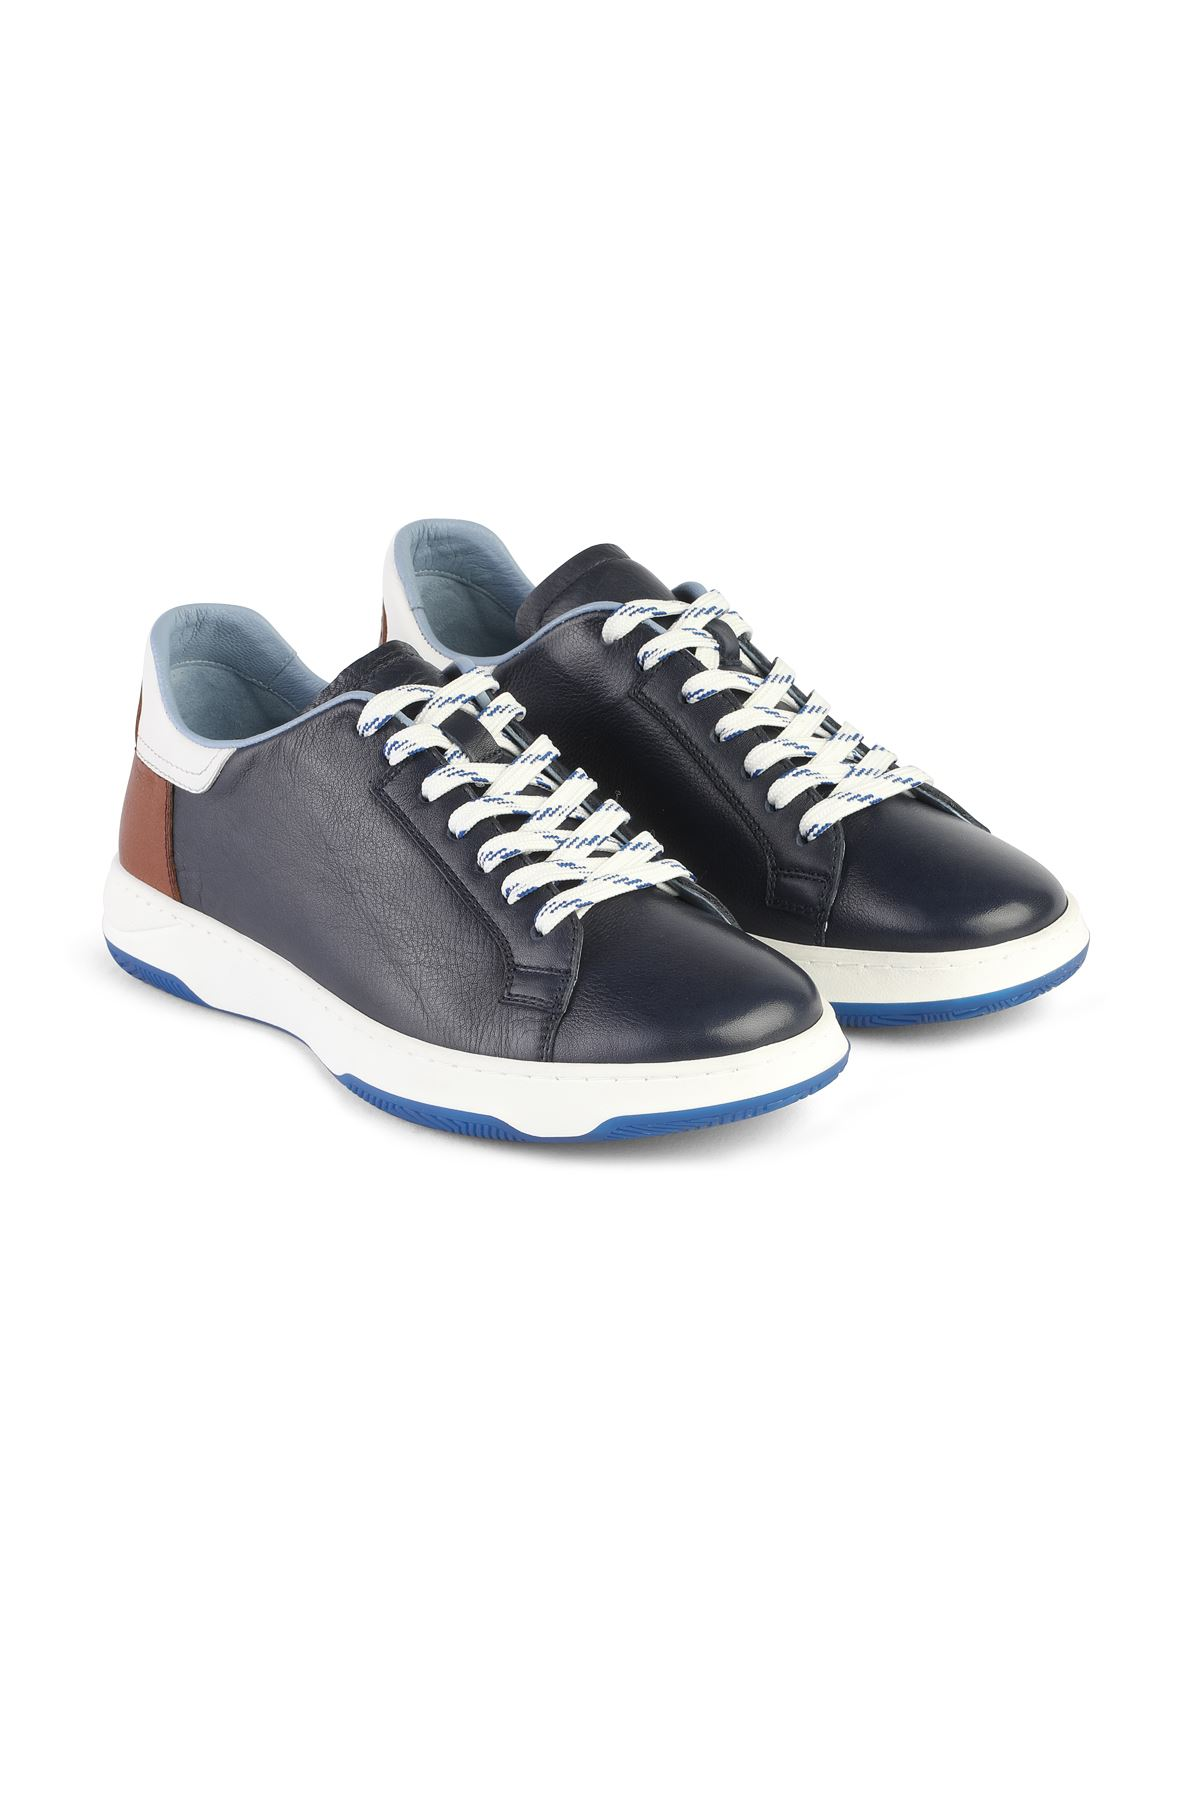 Libero L3227 Lacivert Spor Ayakkabı